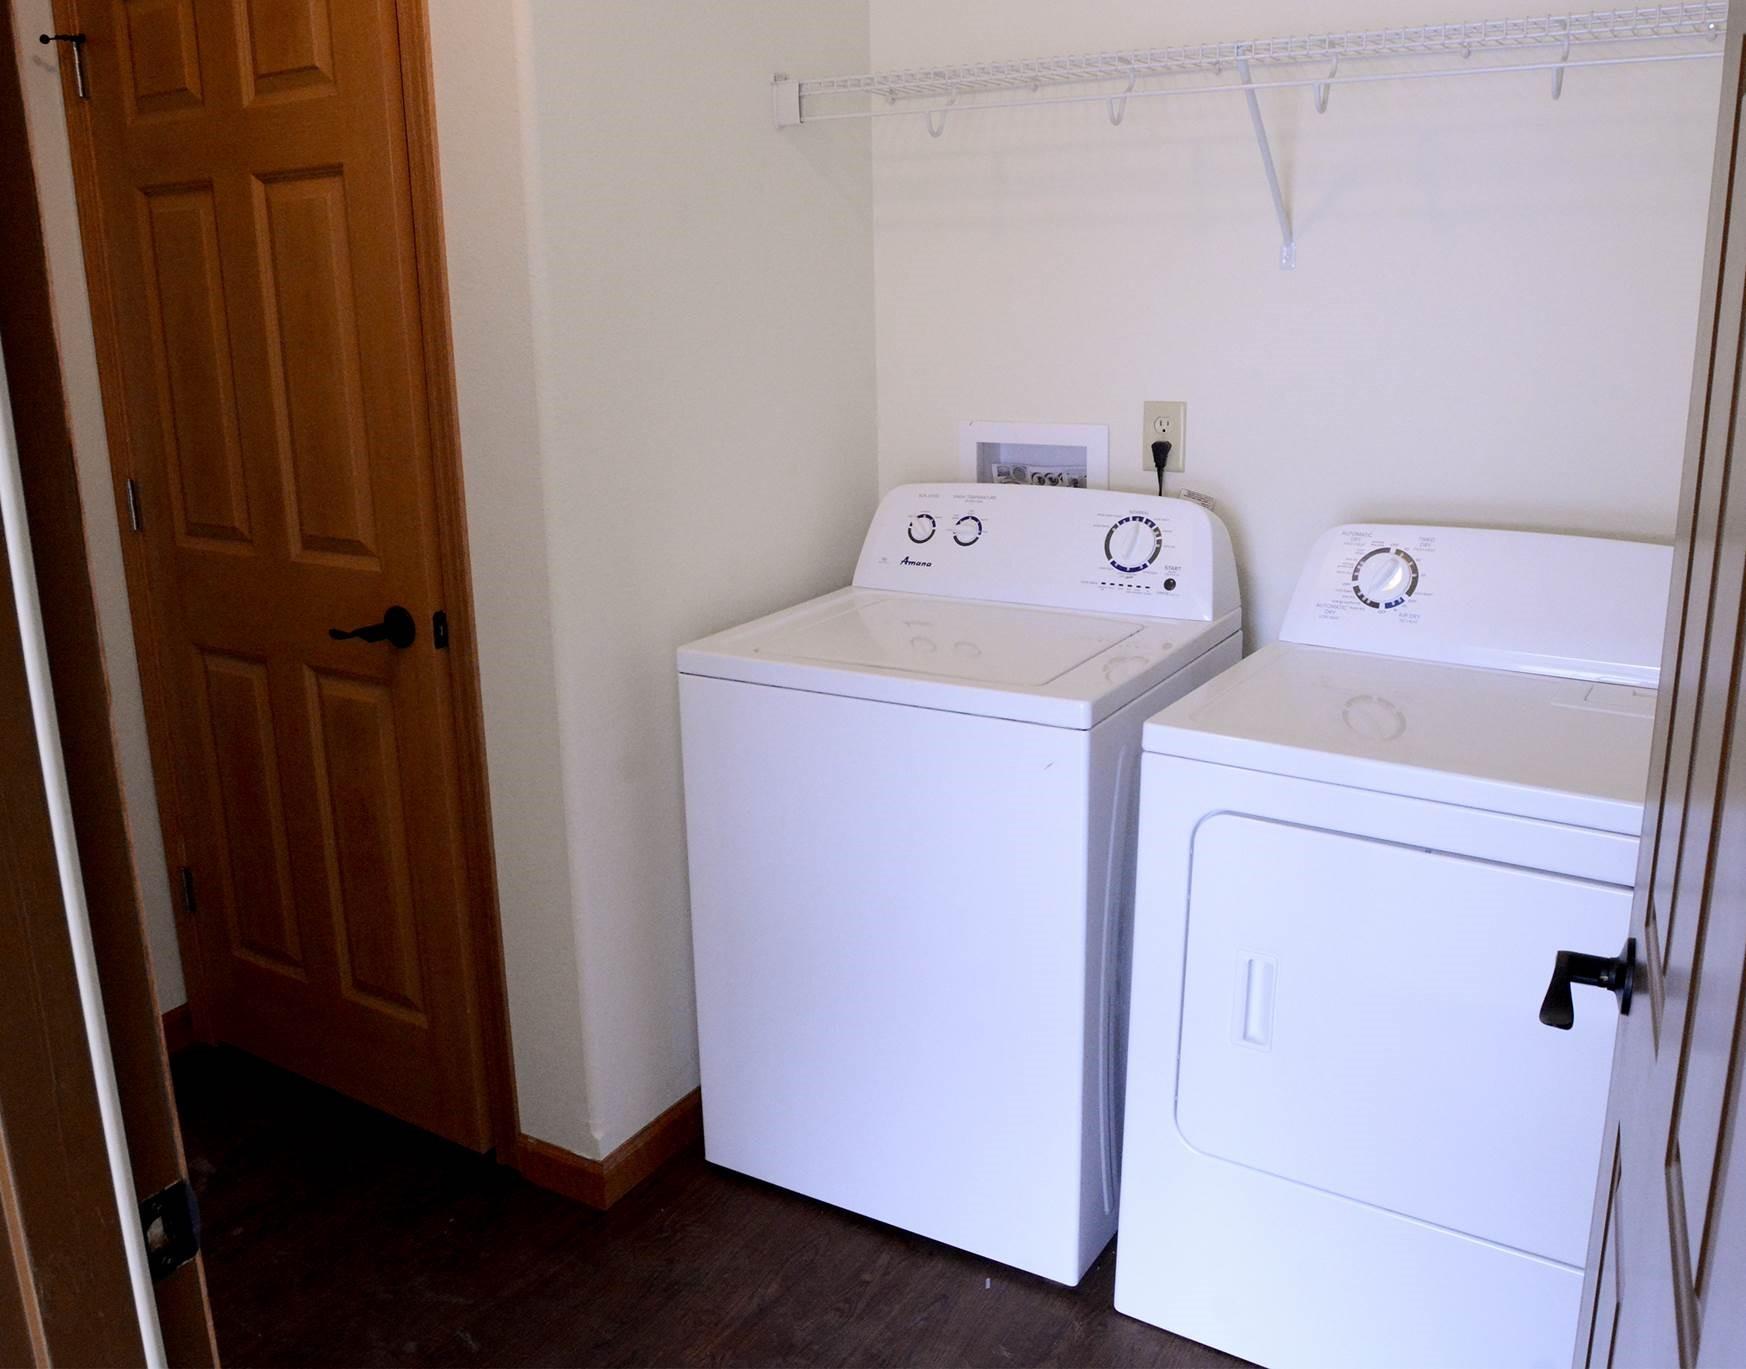 https://0201.nccdn.net/1_2/000/000/101/47f/pre-laundry.jpg